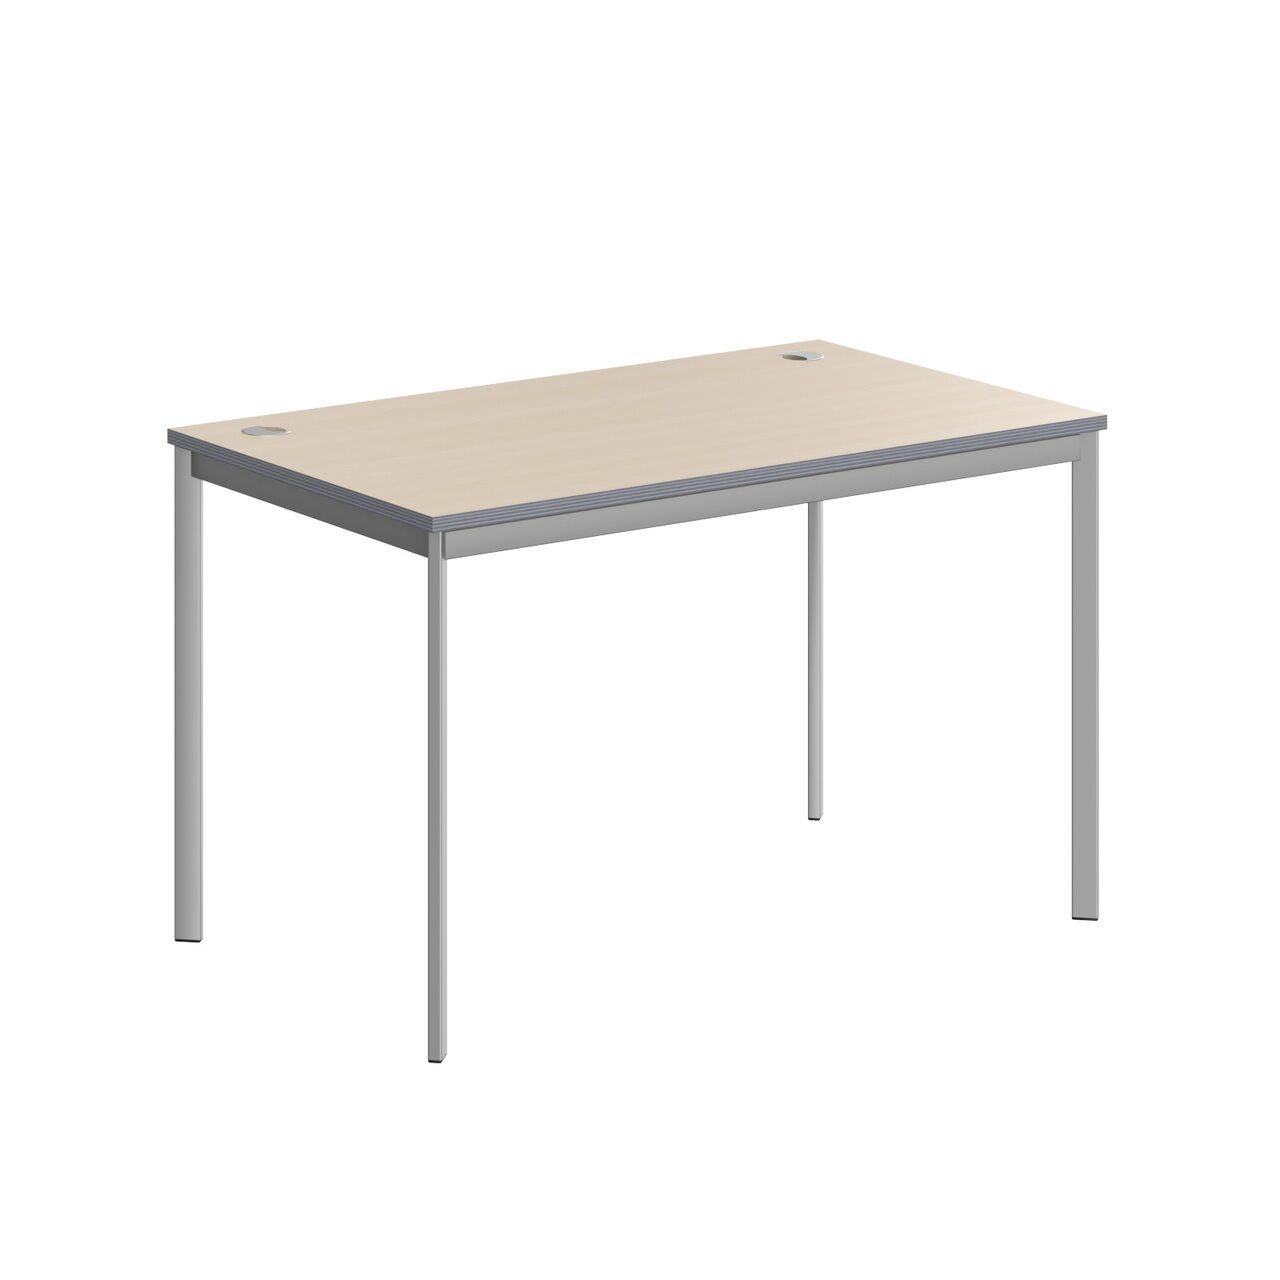 Стол прямой  IMAGO-S 72x120x76 - фото 5